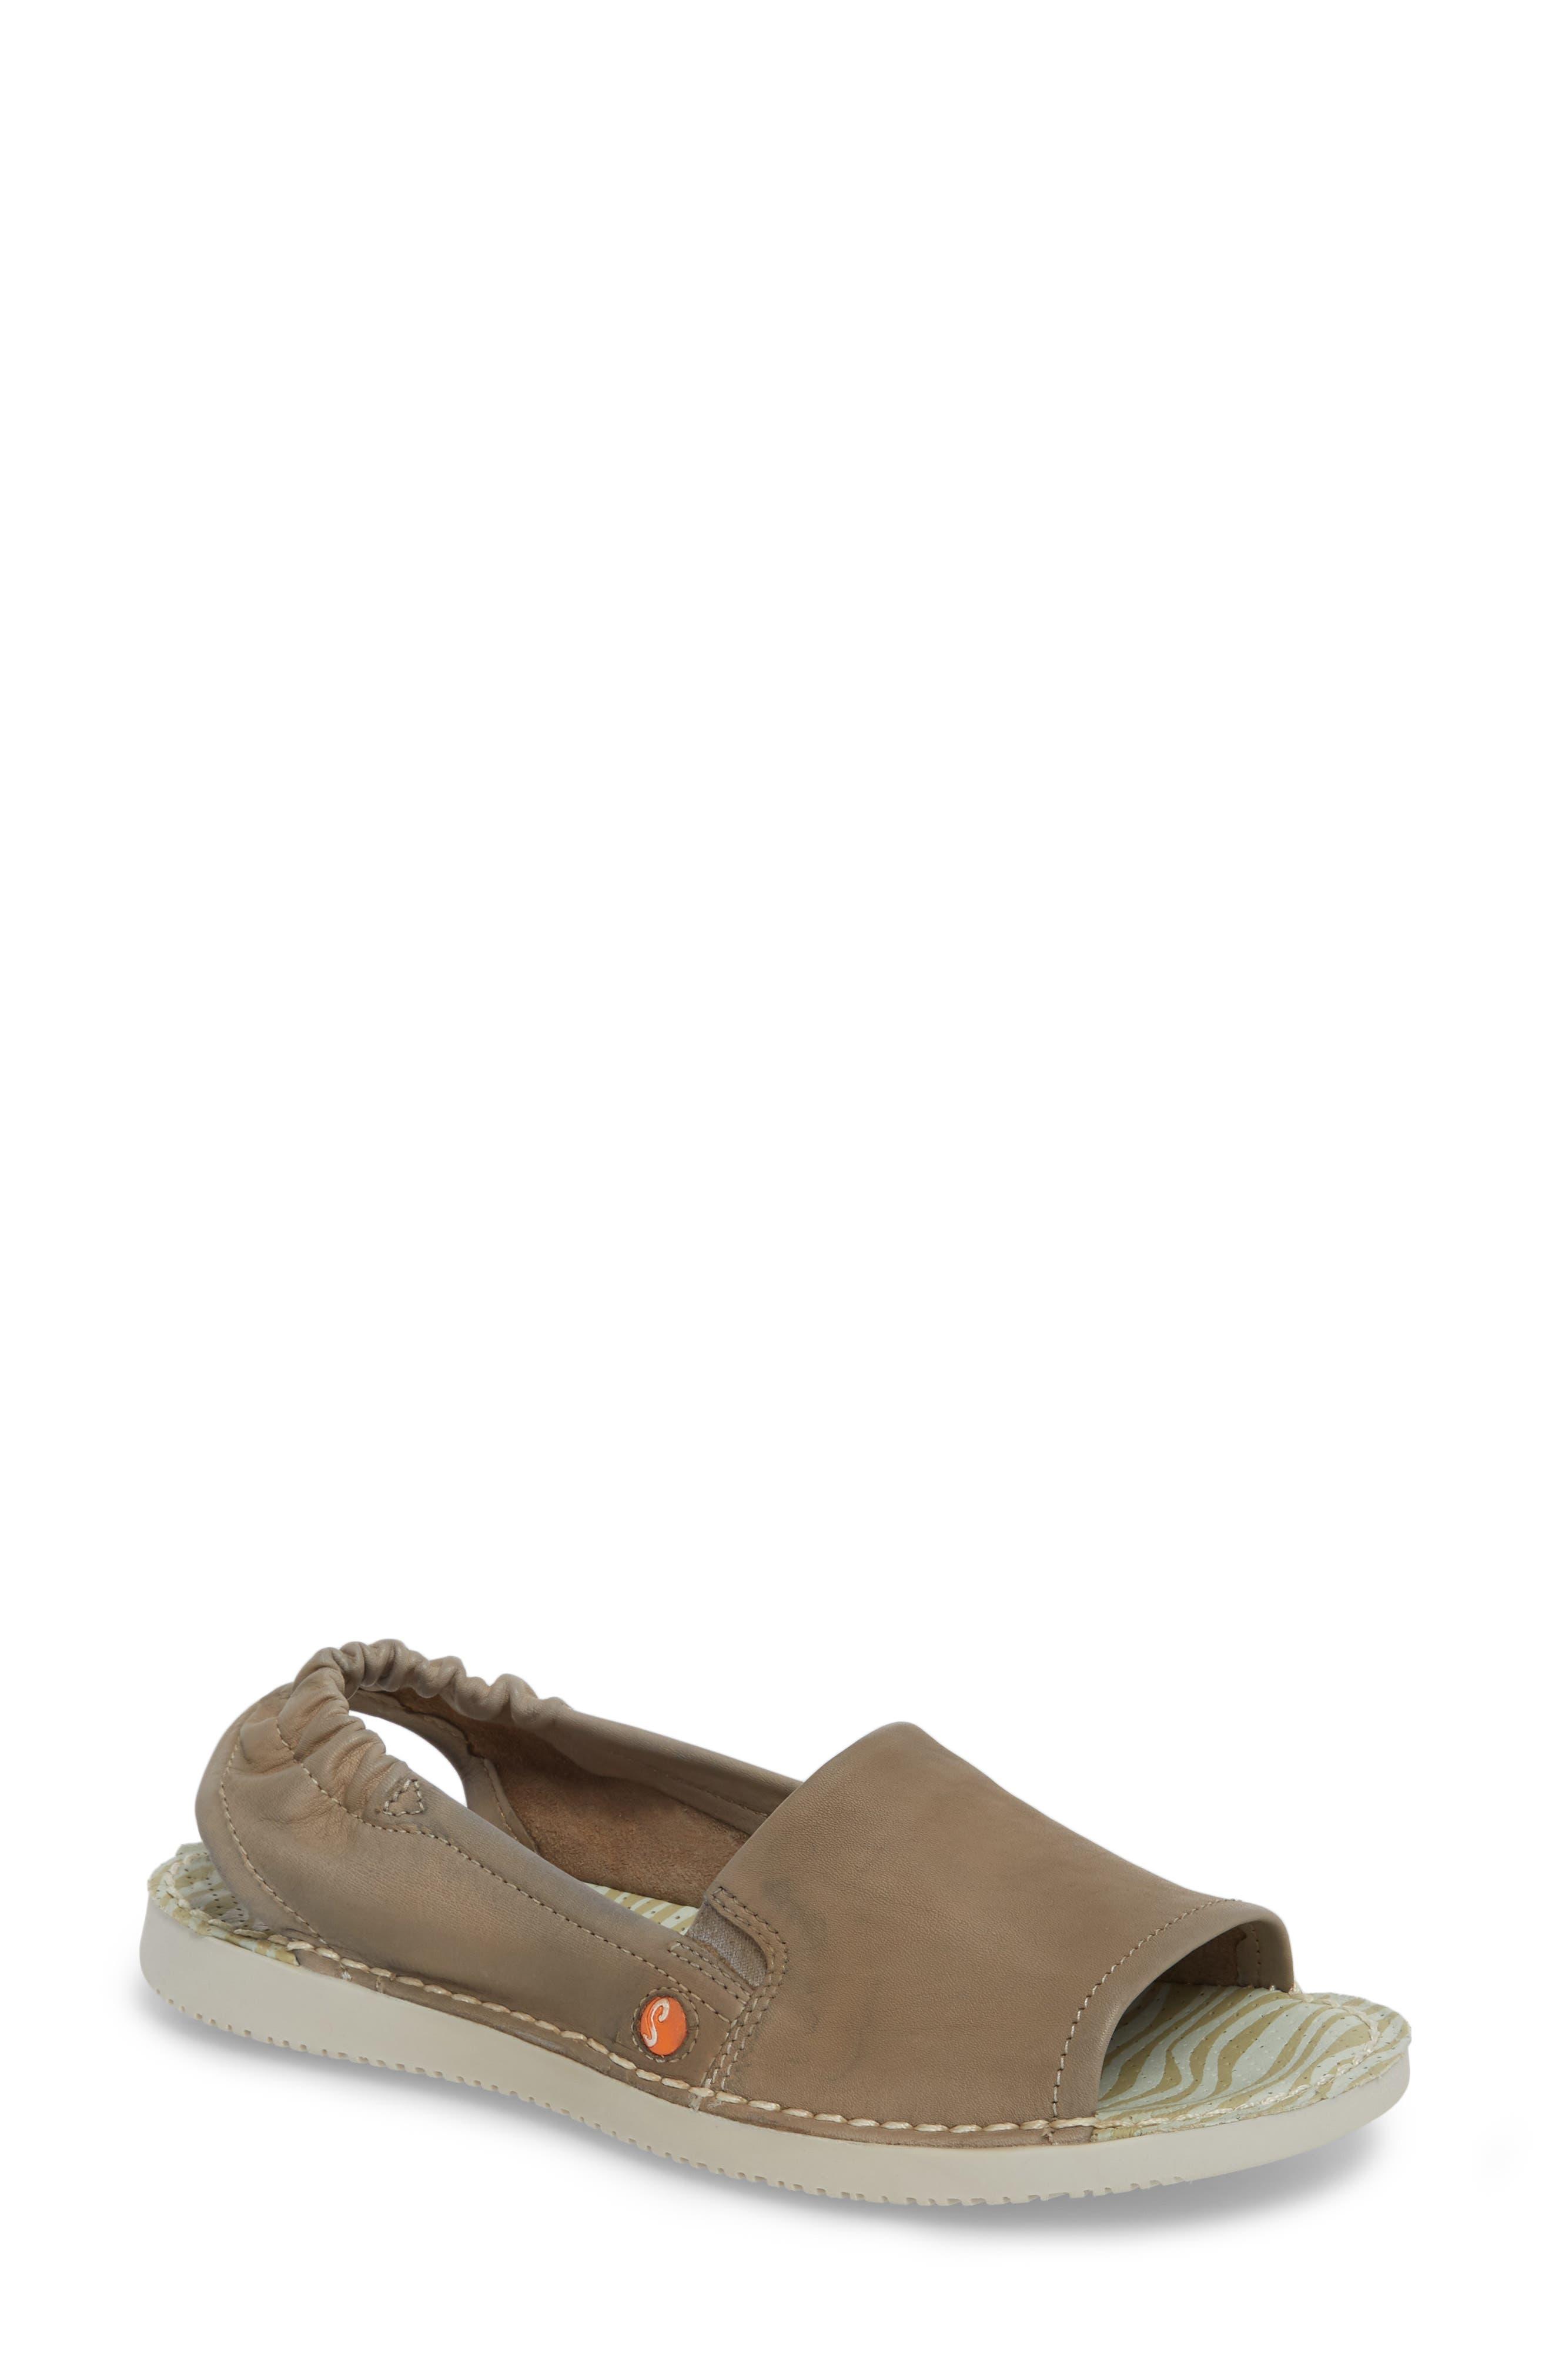 Tee Flat Sandal,                             Main thumbnail 1, color,                             Taupe Leather